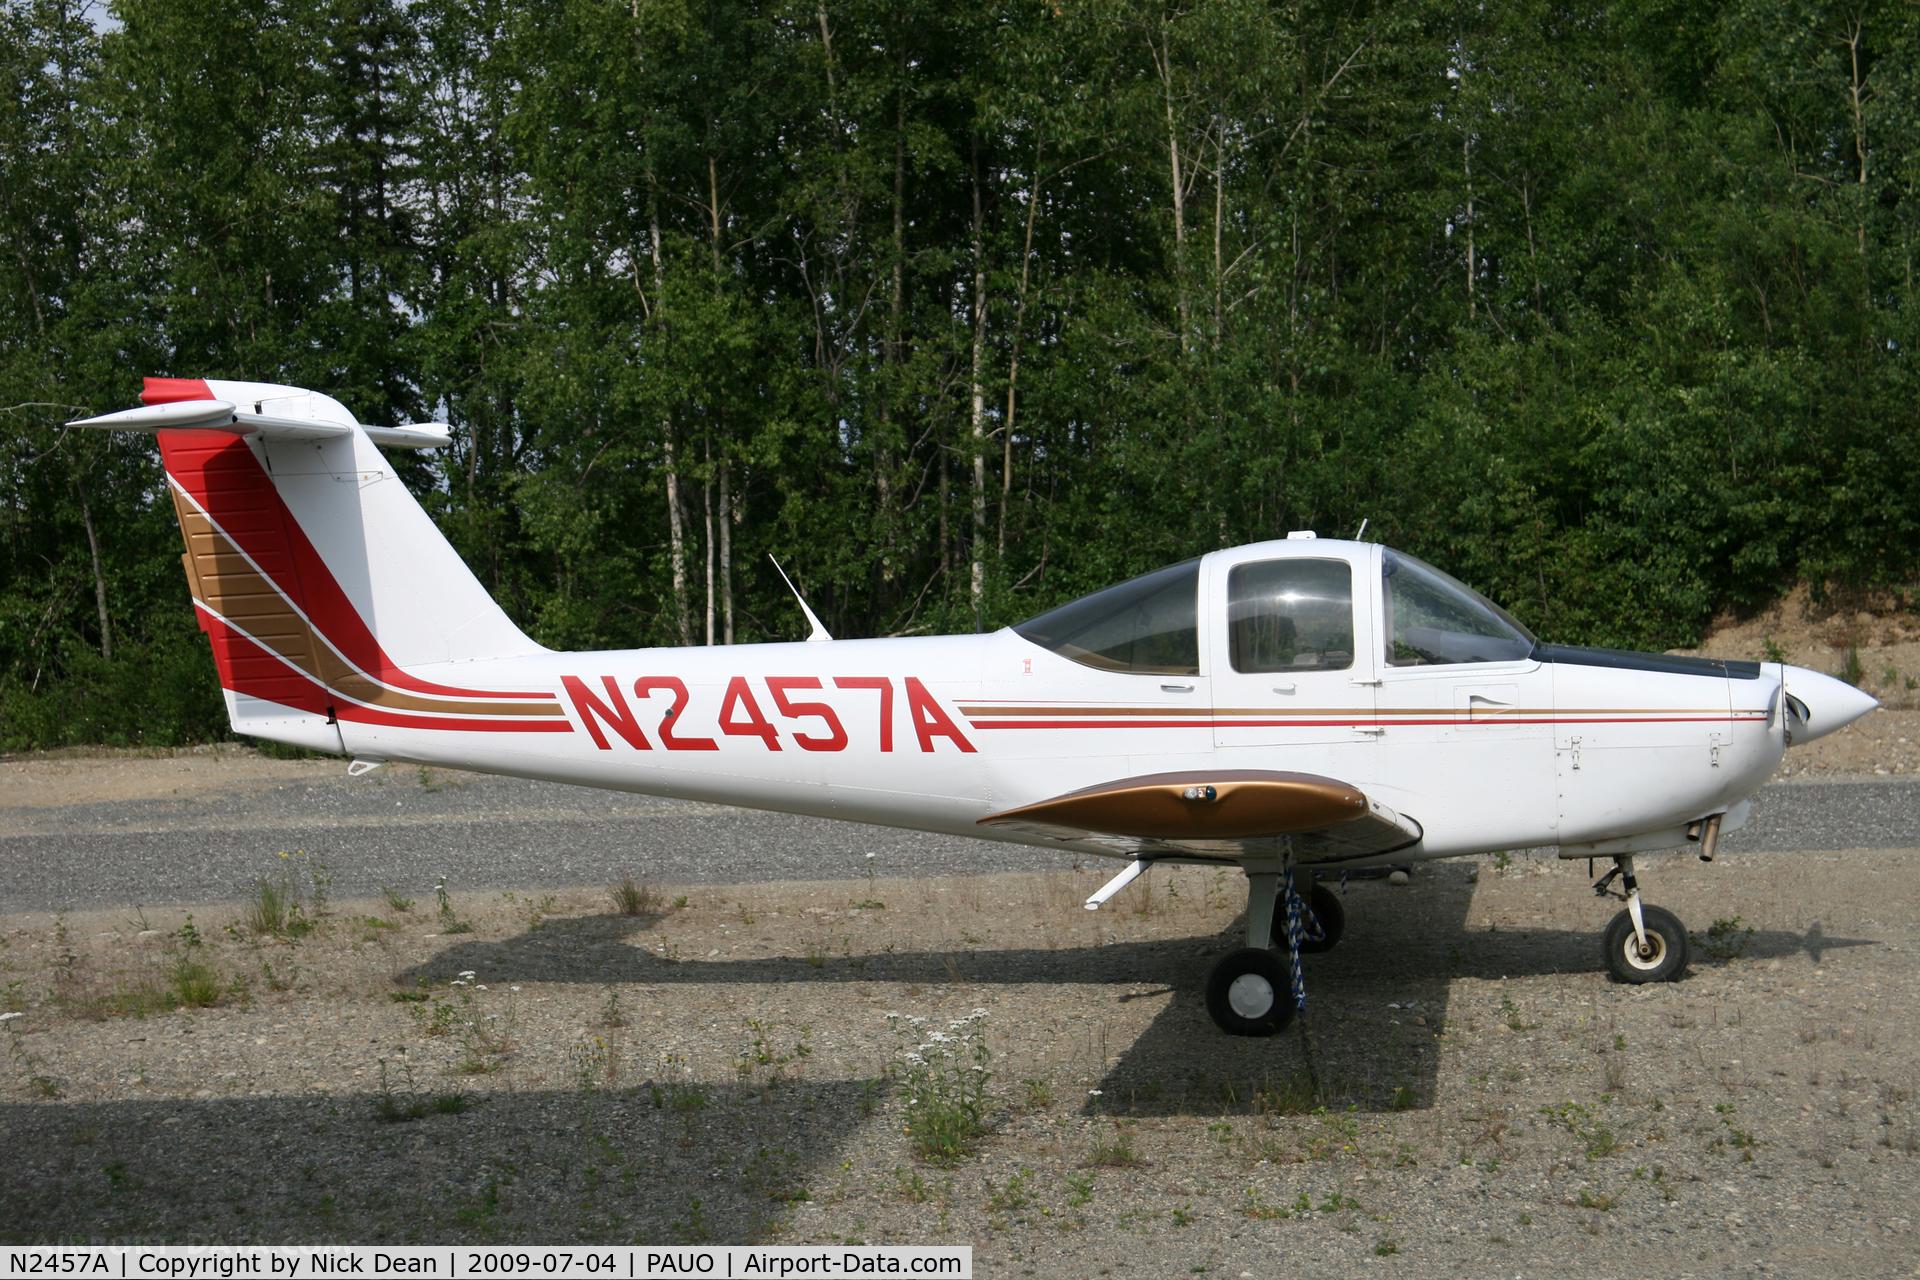 N2457A, 1978 Piper PA-38-112 Tomahawk Tomahawk C/N 38-78A0699, PAUO